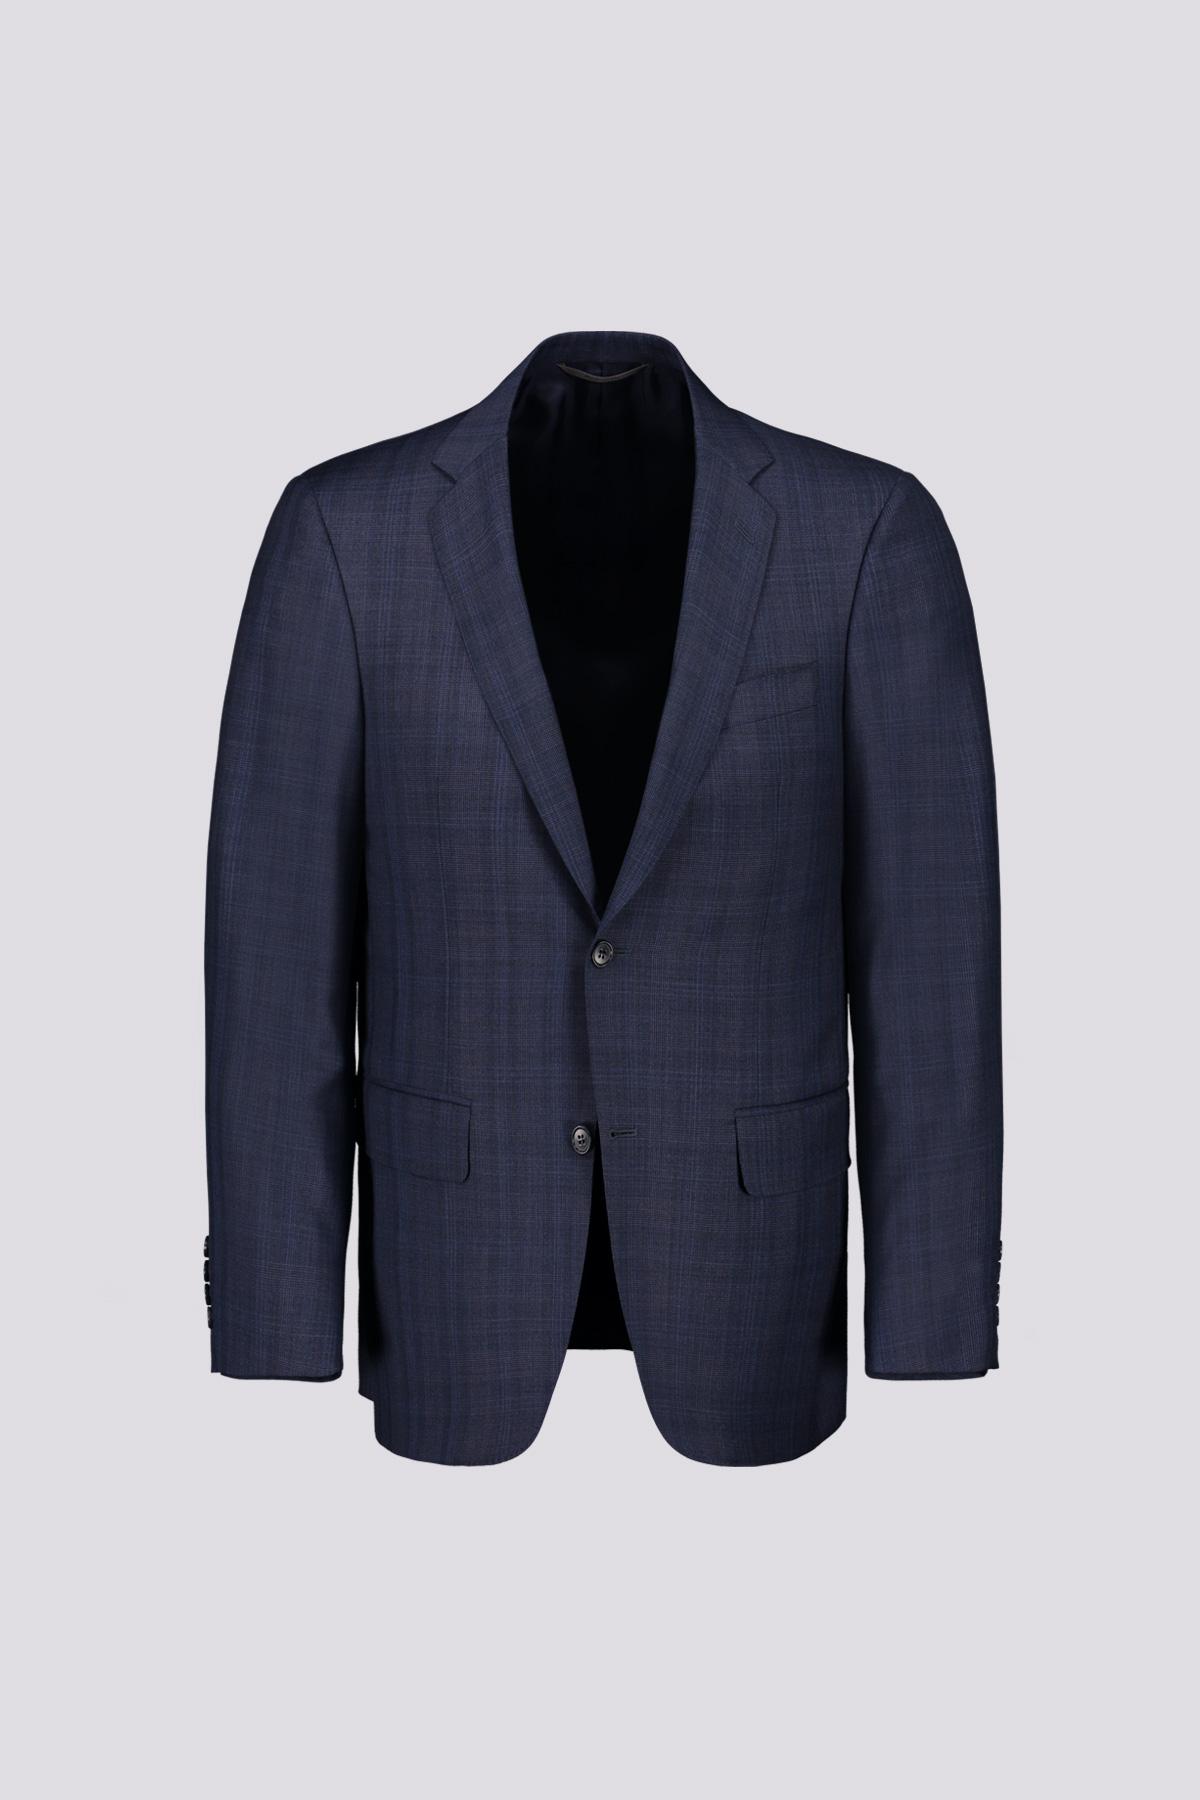 Traje recto marca Canali color azul cobalto medio con cuadro ventana